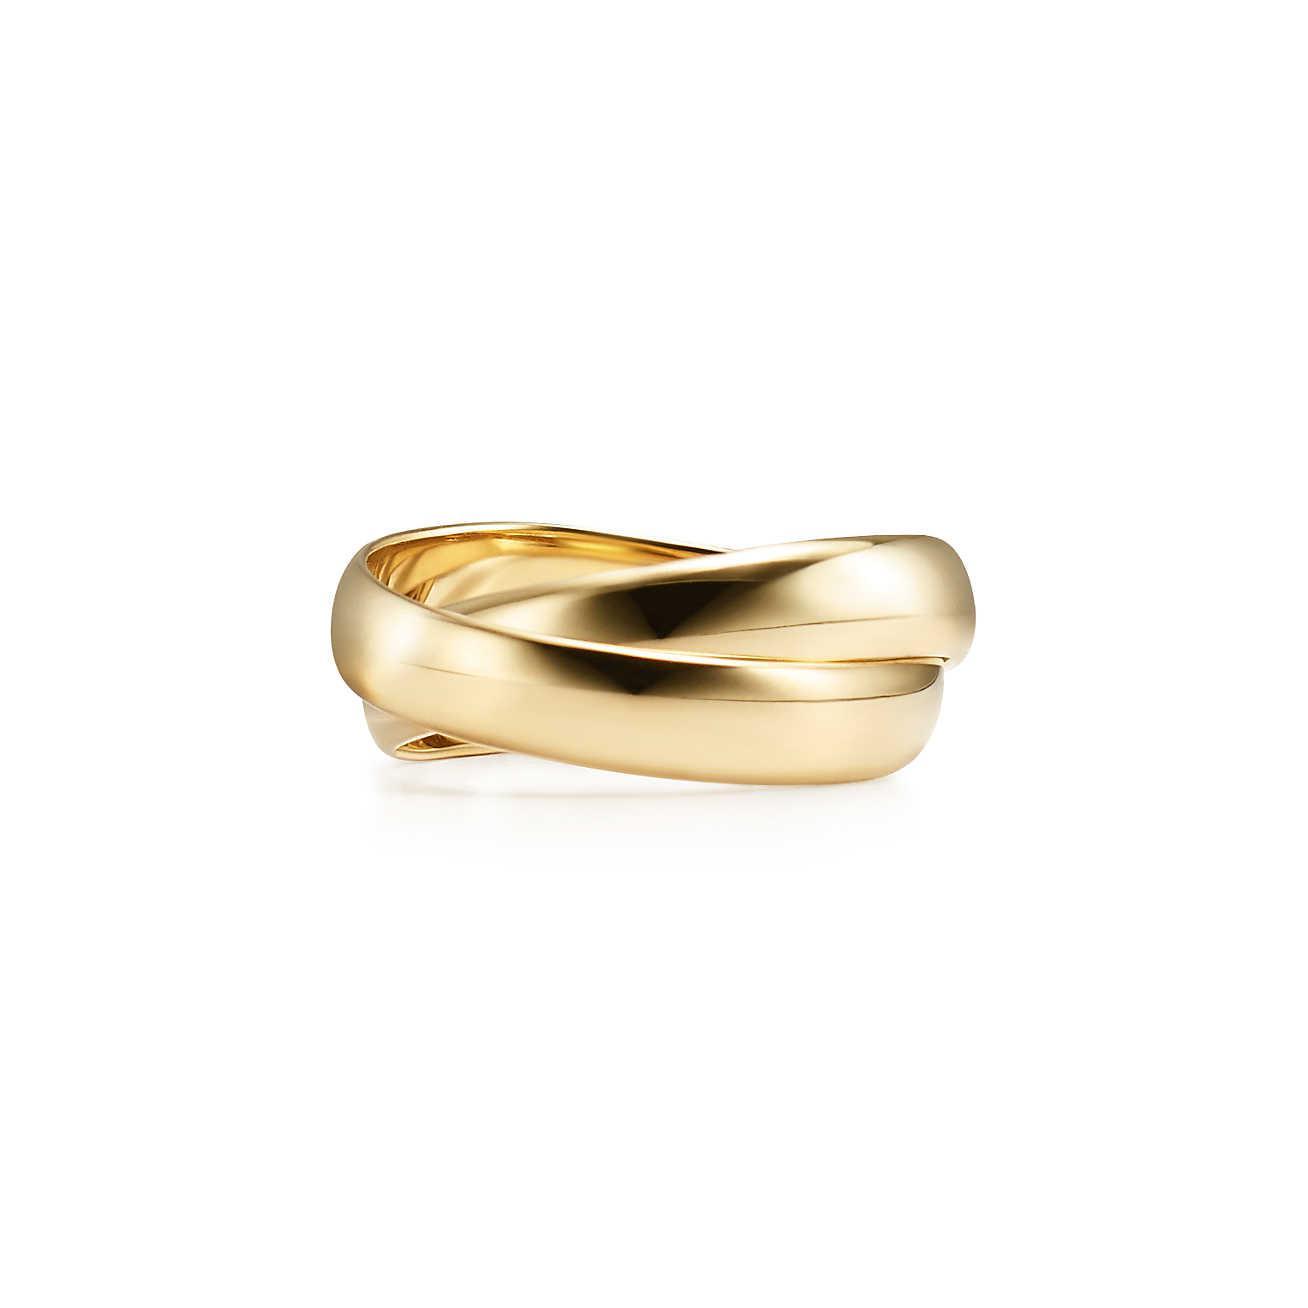 Palomas Graffiti arrow ring in 18ct rose gold - Size 7 1/2 Tiffany & Co. lzOHze